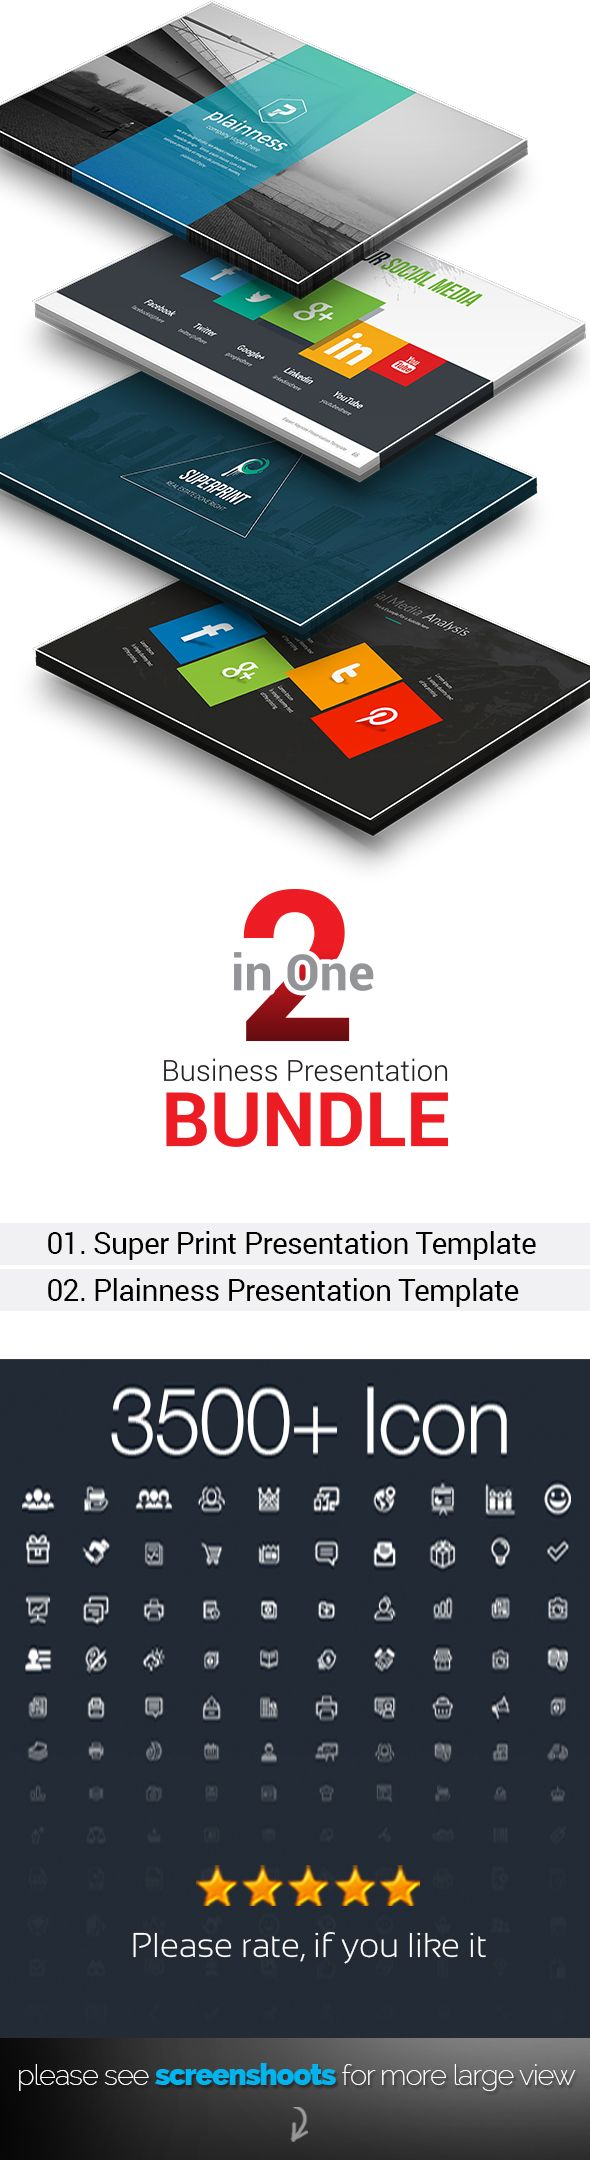 2 in 1 Business Plan Keynote Bundle